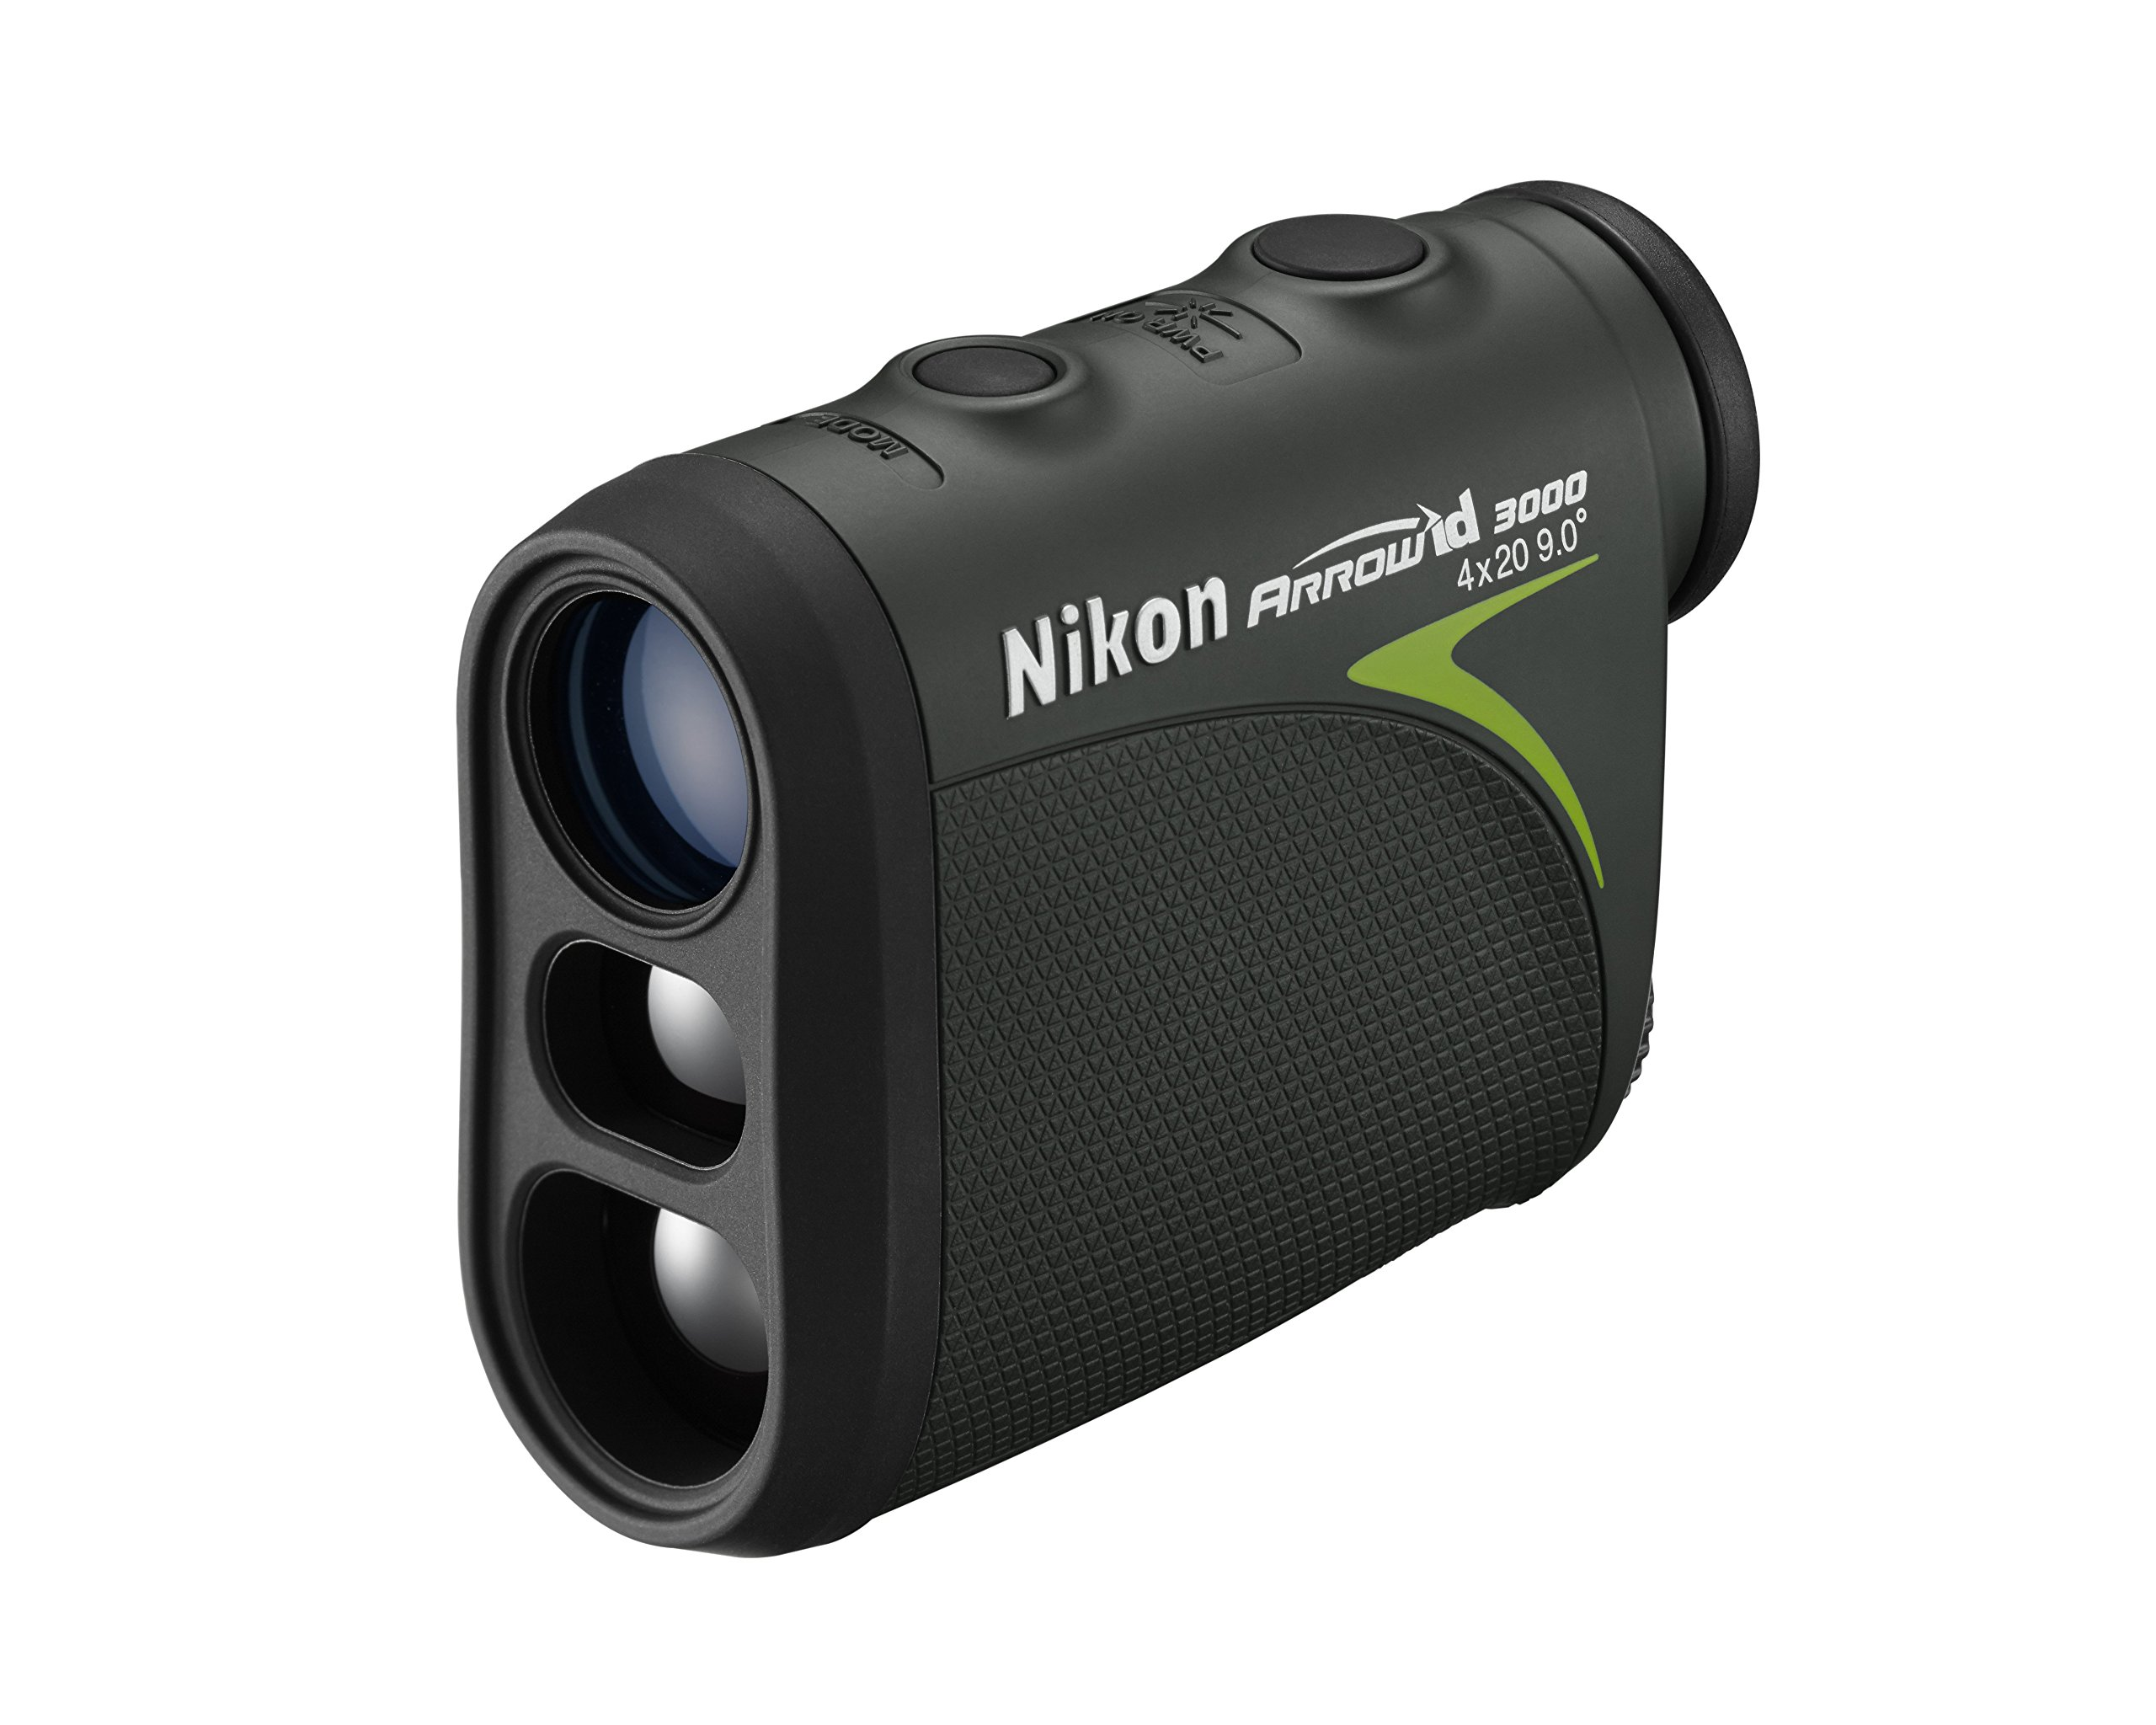 Nikon 16224 Arrow ID 3000 Bowhunting Laser Rangefinder by Nikon (Image #1)